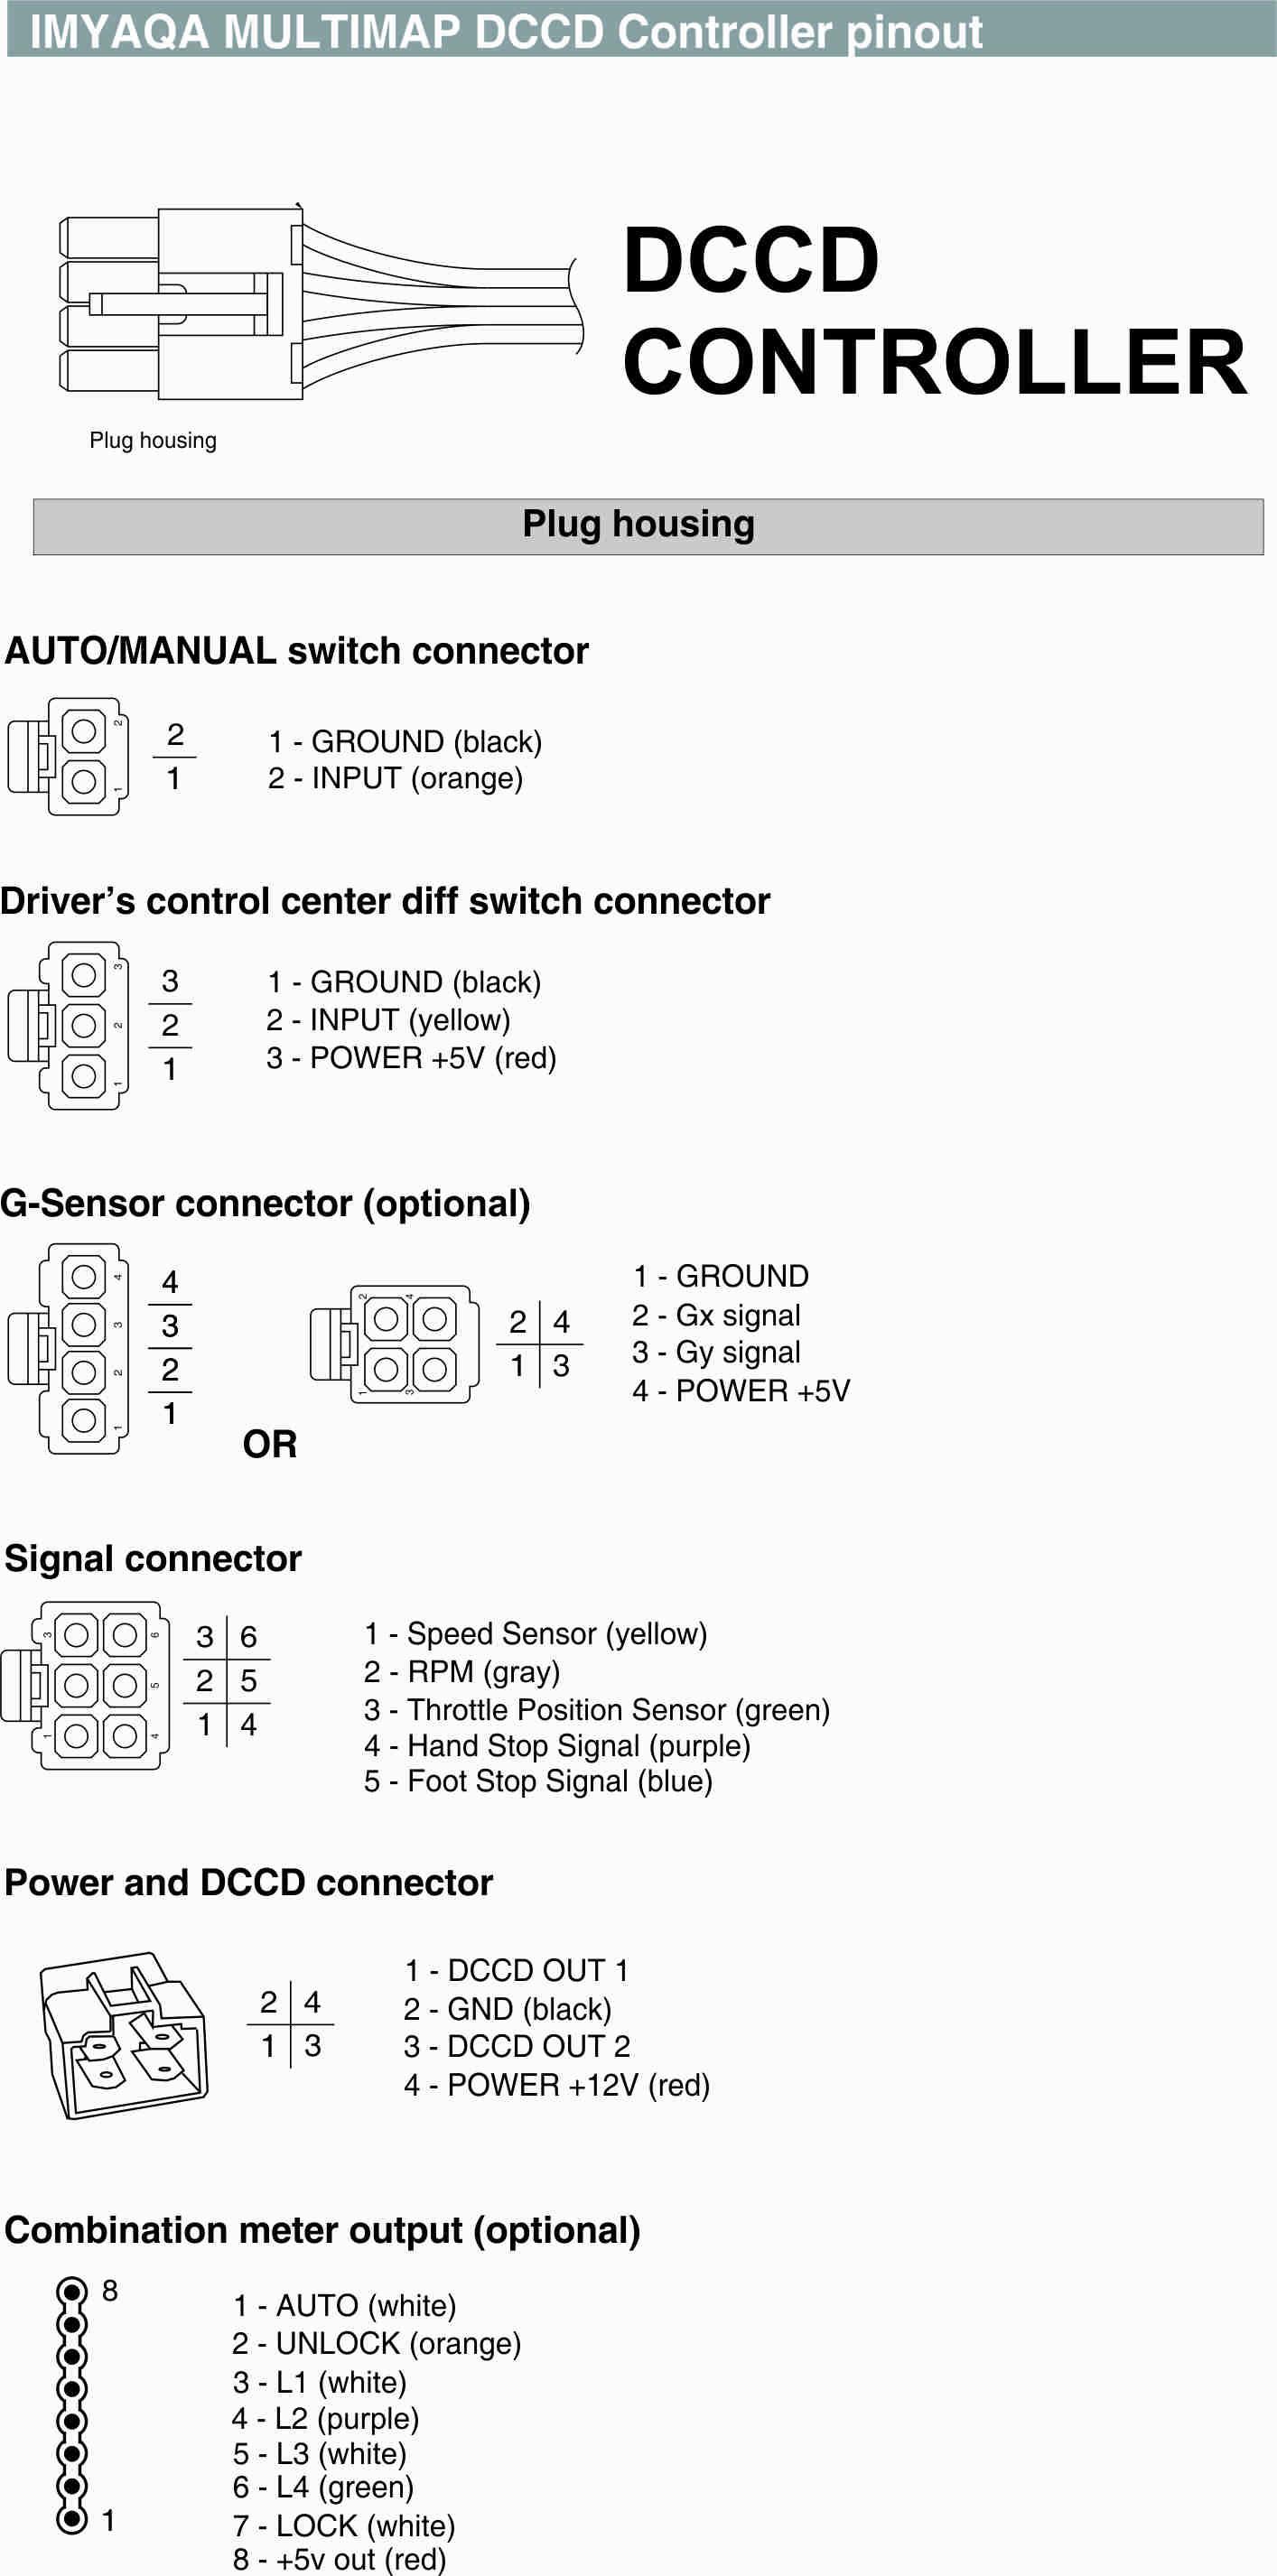 Статья о версии DCCD Контроллера до Февраля 2018 - IMYAQA